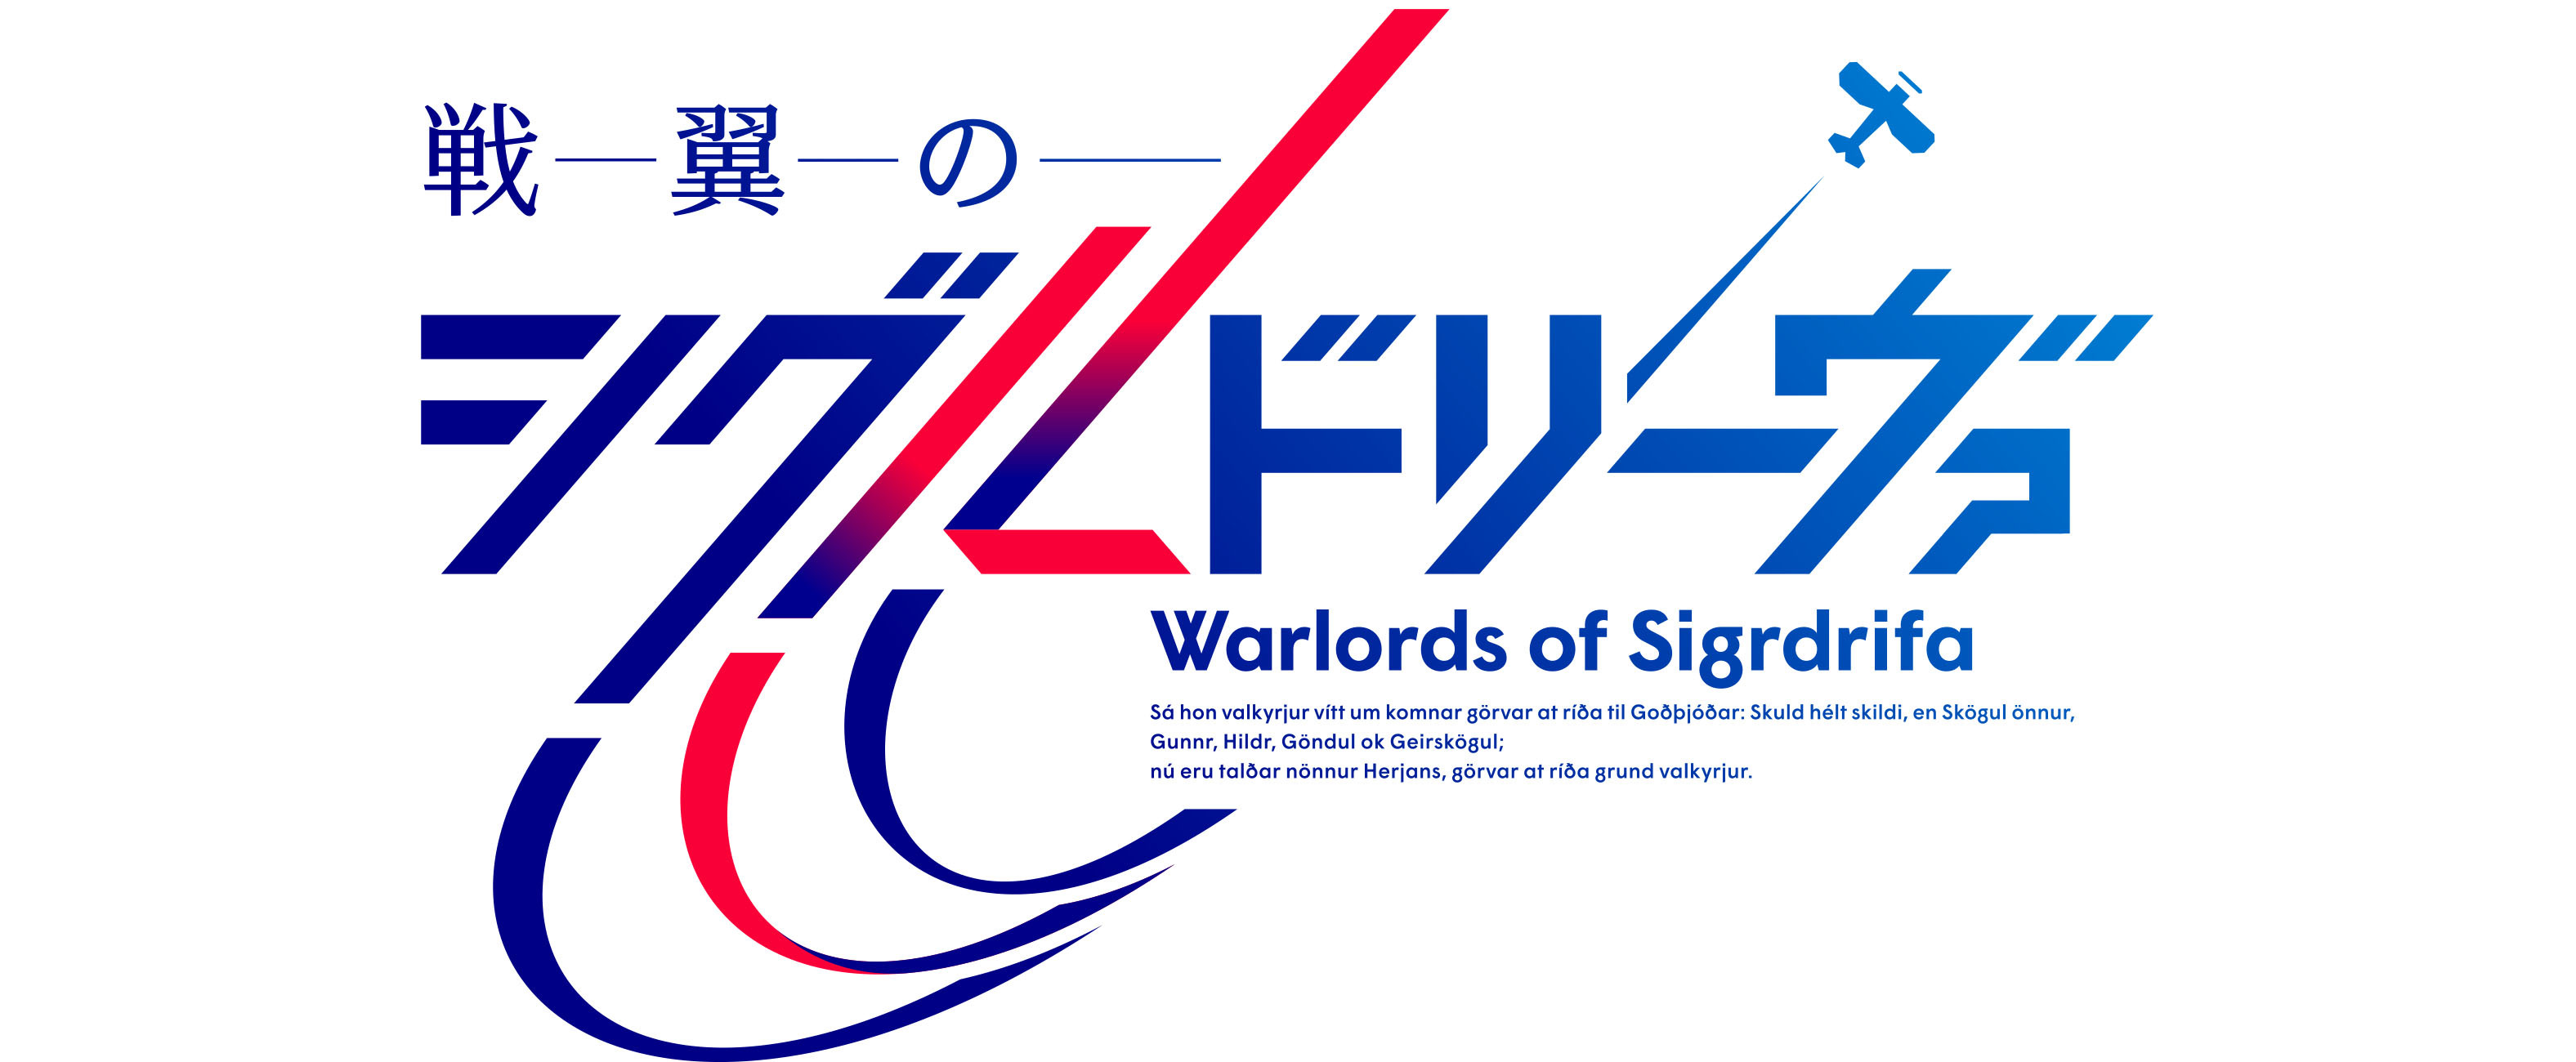 TVアニメ『戦翼のシグルドリーヴァ』ロゴ (C)戦翼倶楽部/909整備補給隊